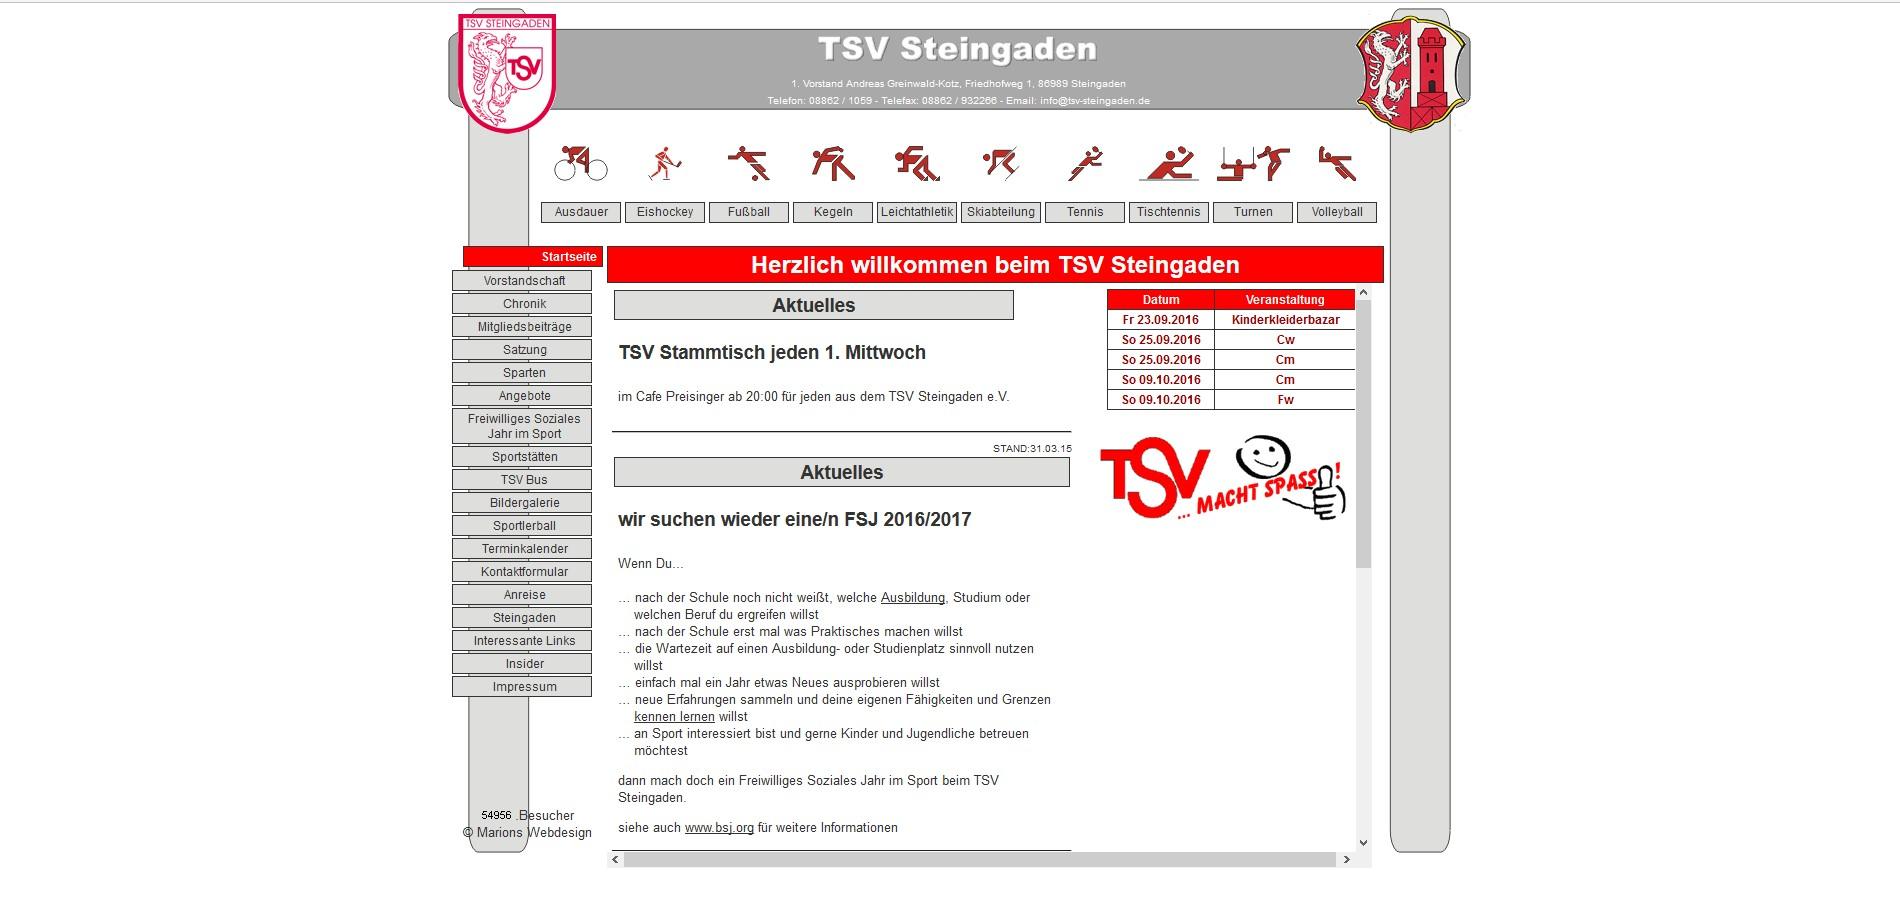 TSV Steingaden